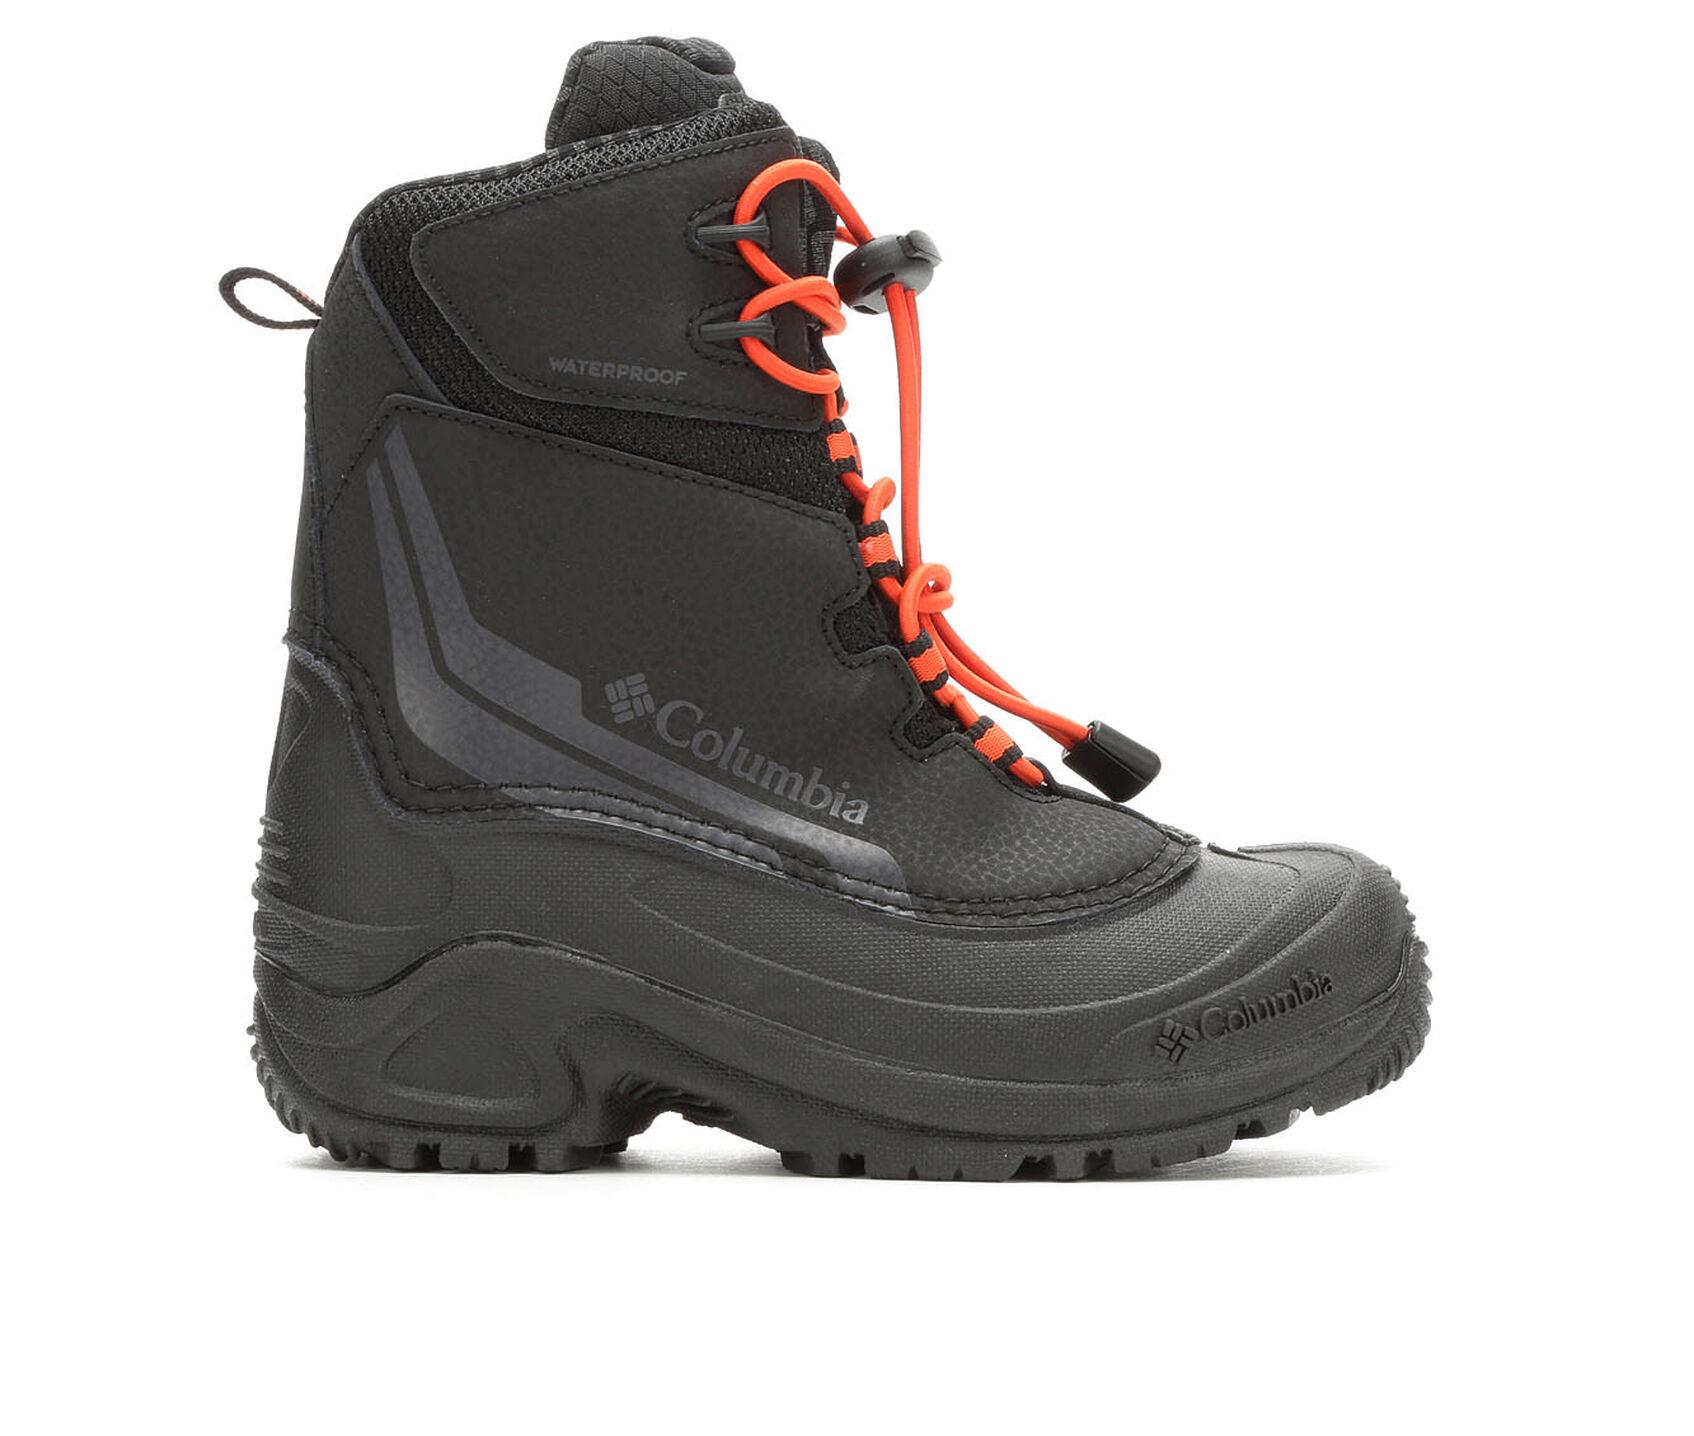 8a37ea18997 Boys' Columbia Little Kid & Big Kid Bugaboot IV Winter Boots